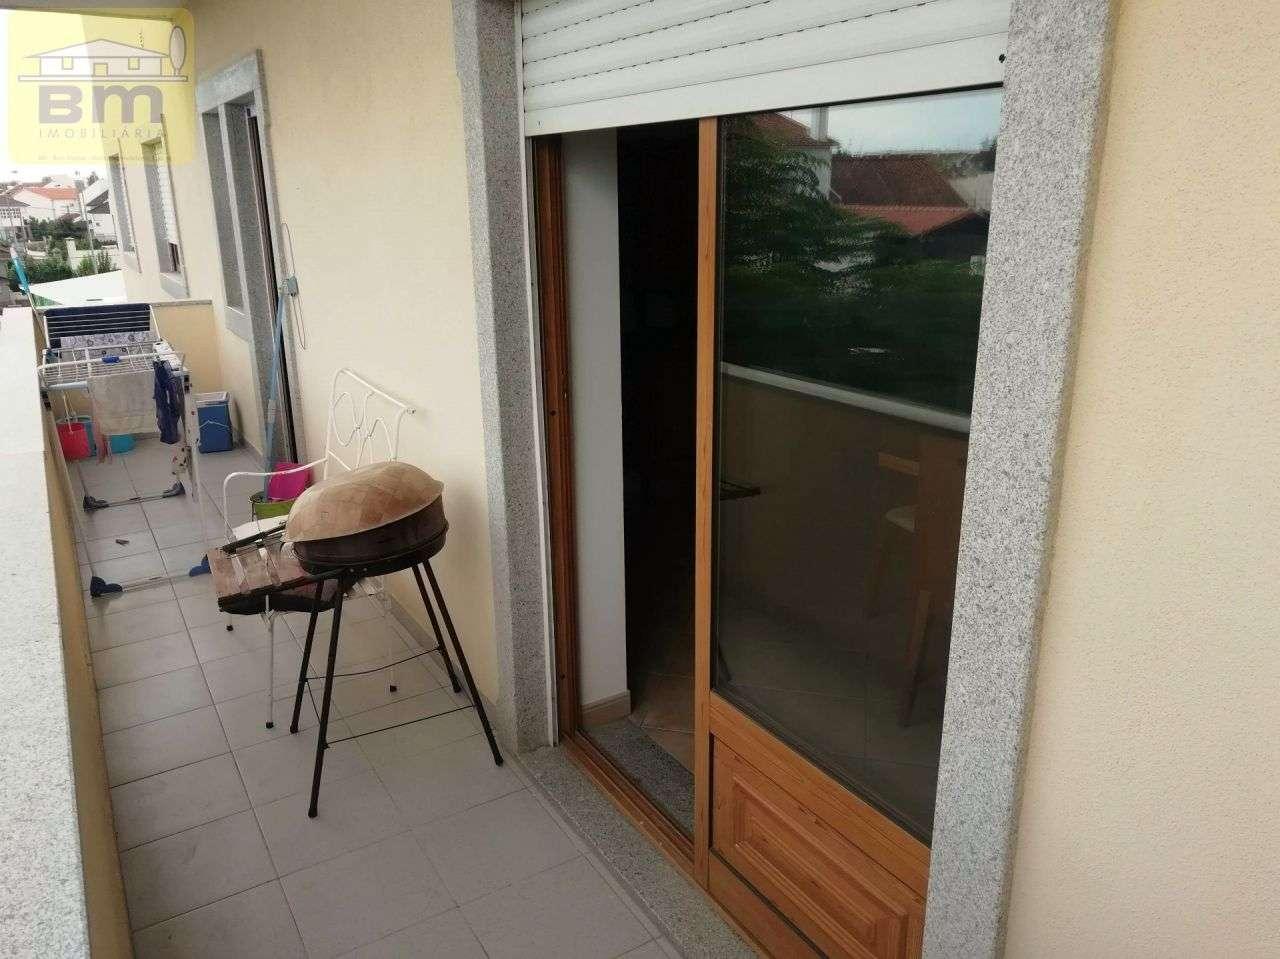 Apartamento para comprar, Alcains, Castelo Branco - Foto 5